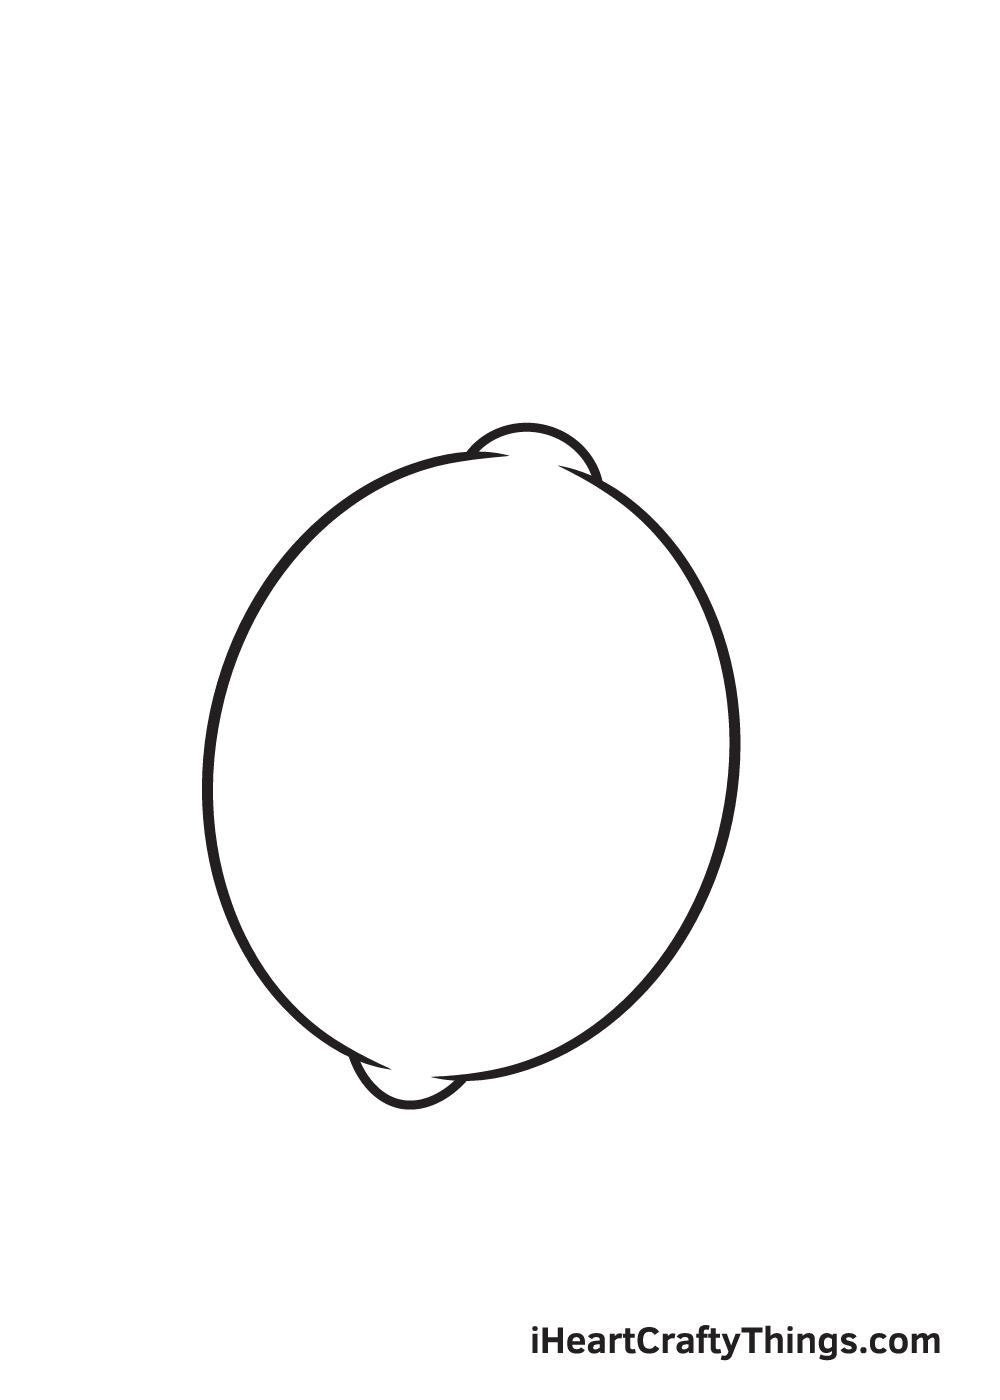 lemon drawing step 4